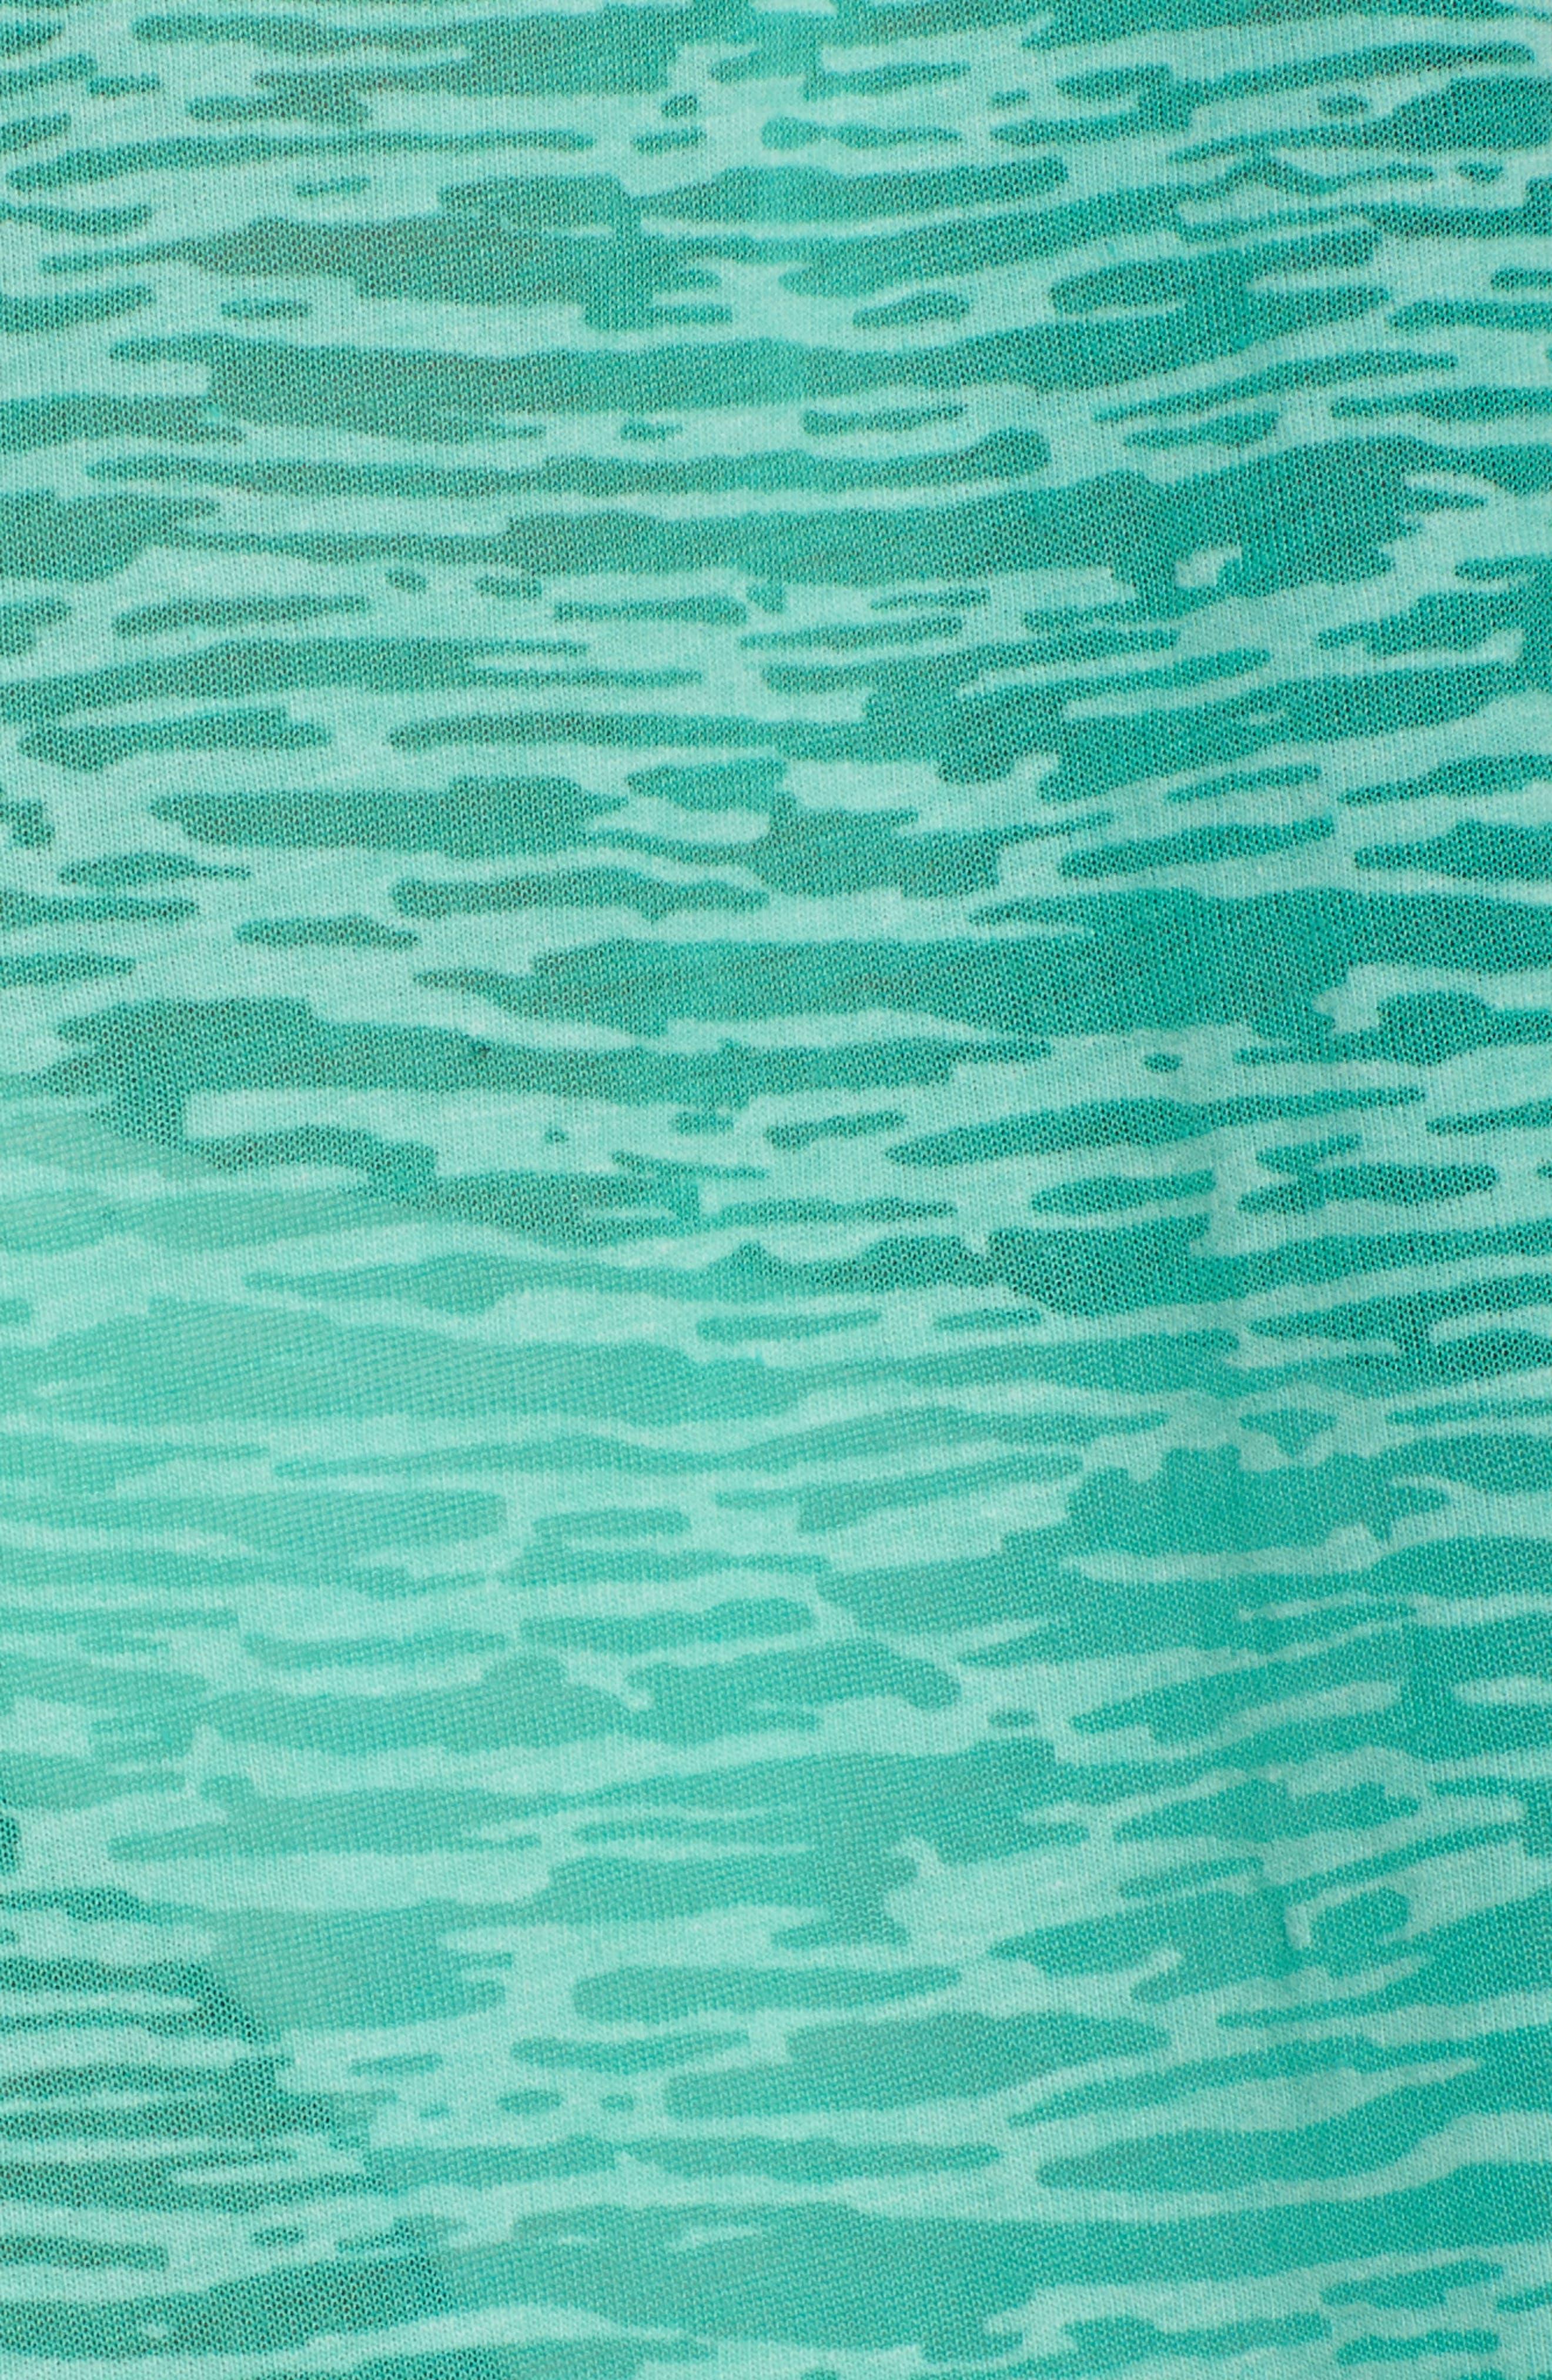 Cover-Up Sundress,                             Alternate thumbnail 6, color,                             Mint